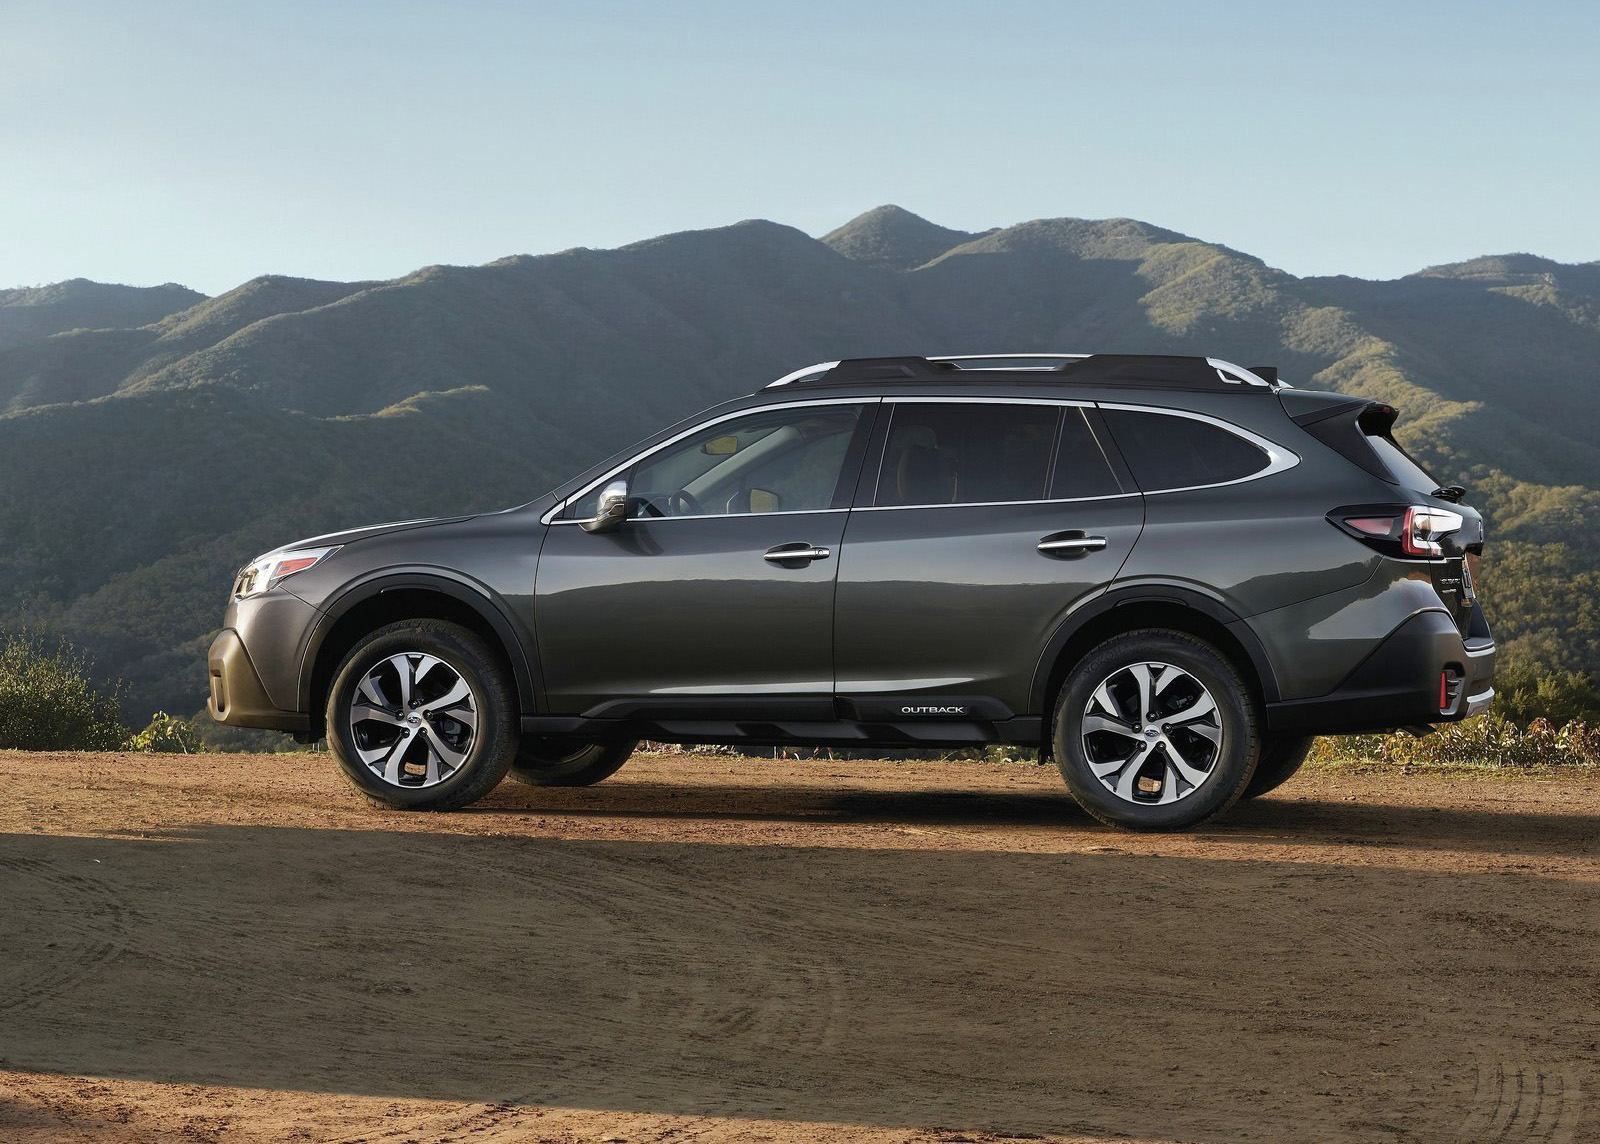 2021 Subaru Outback Turbo Hybrid Spesification